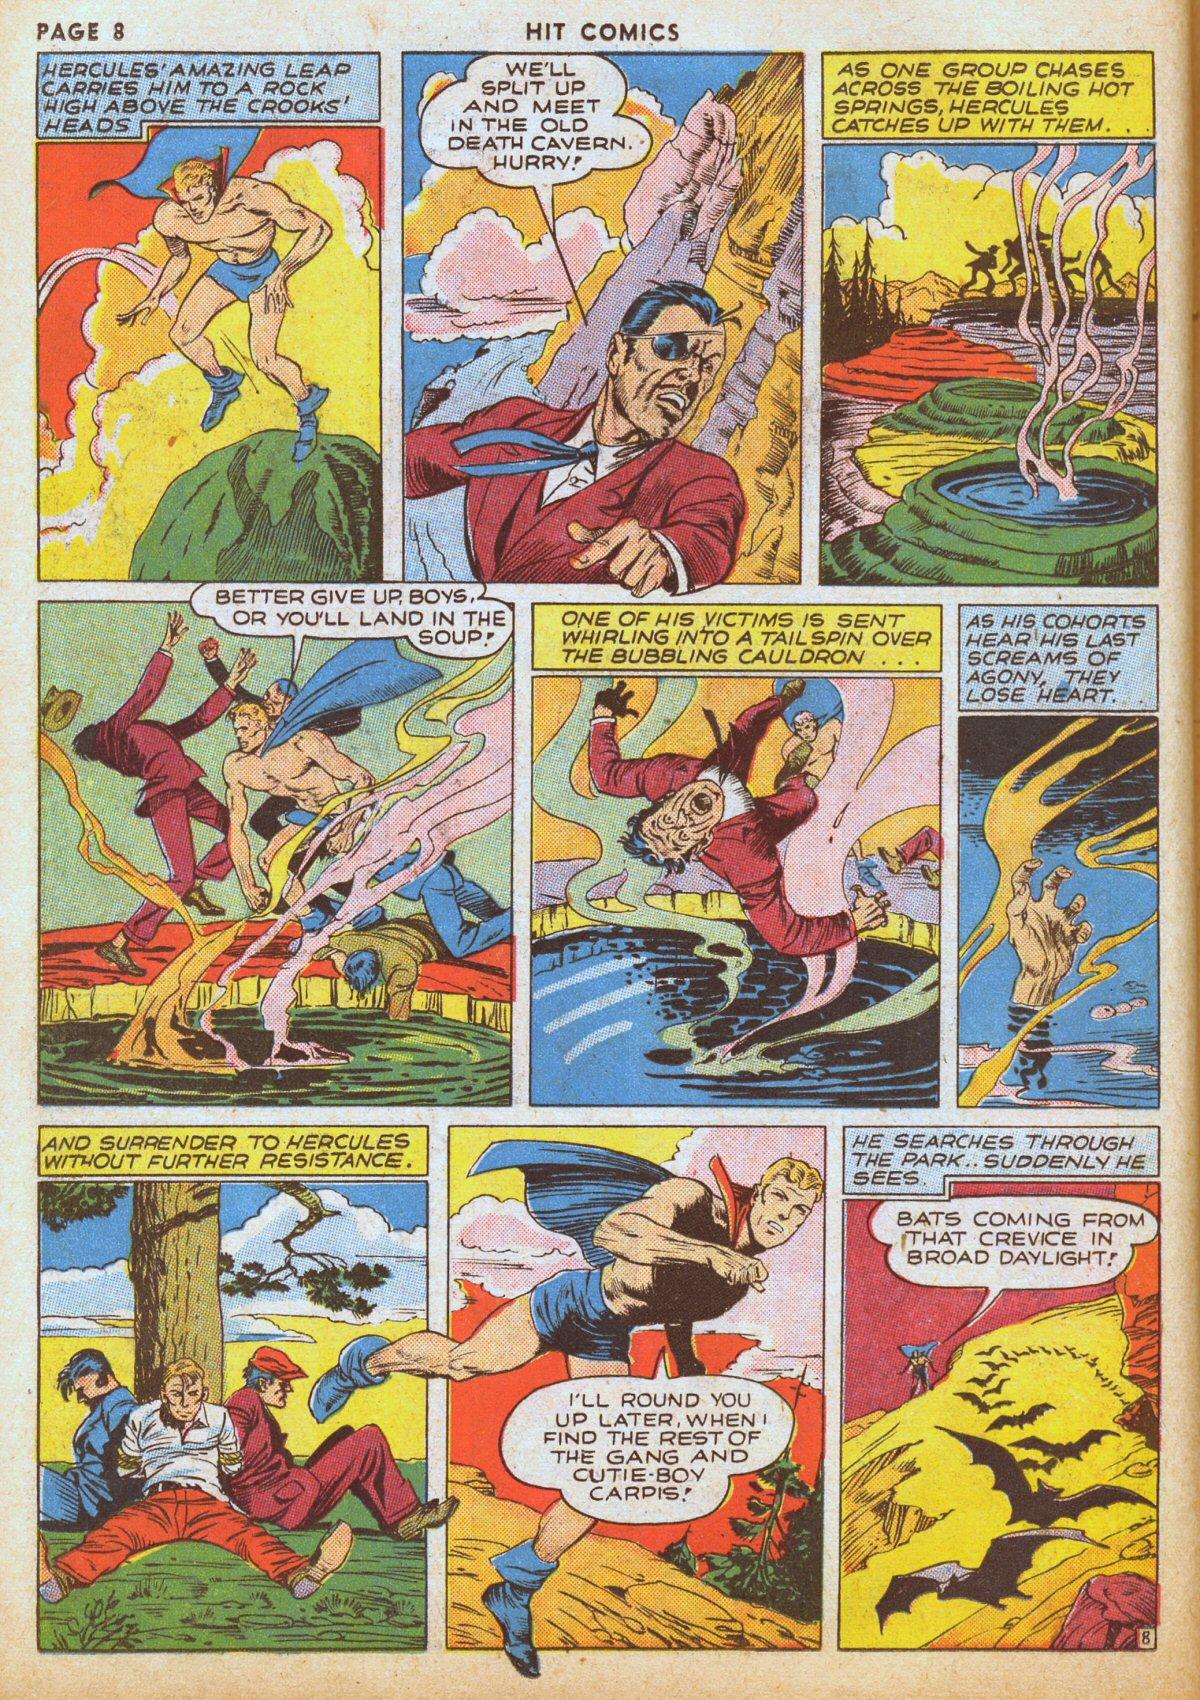 Read online Hit Comics comic -  Issue #12 - 10